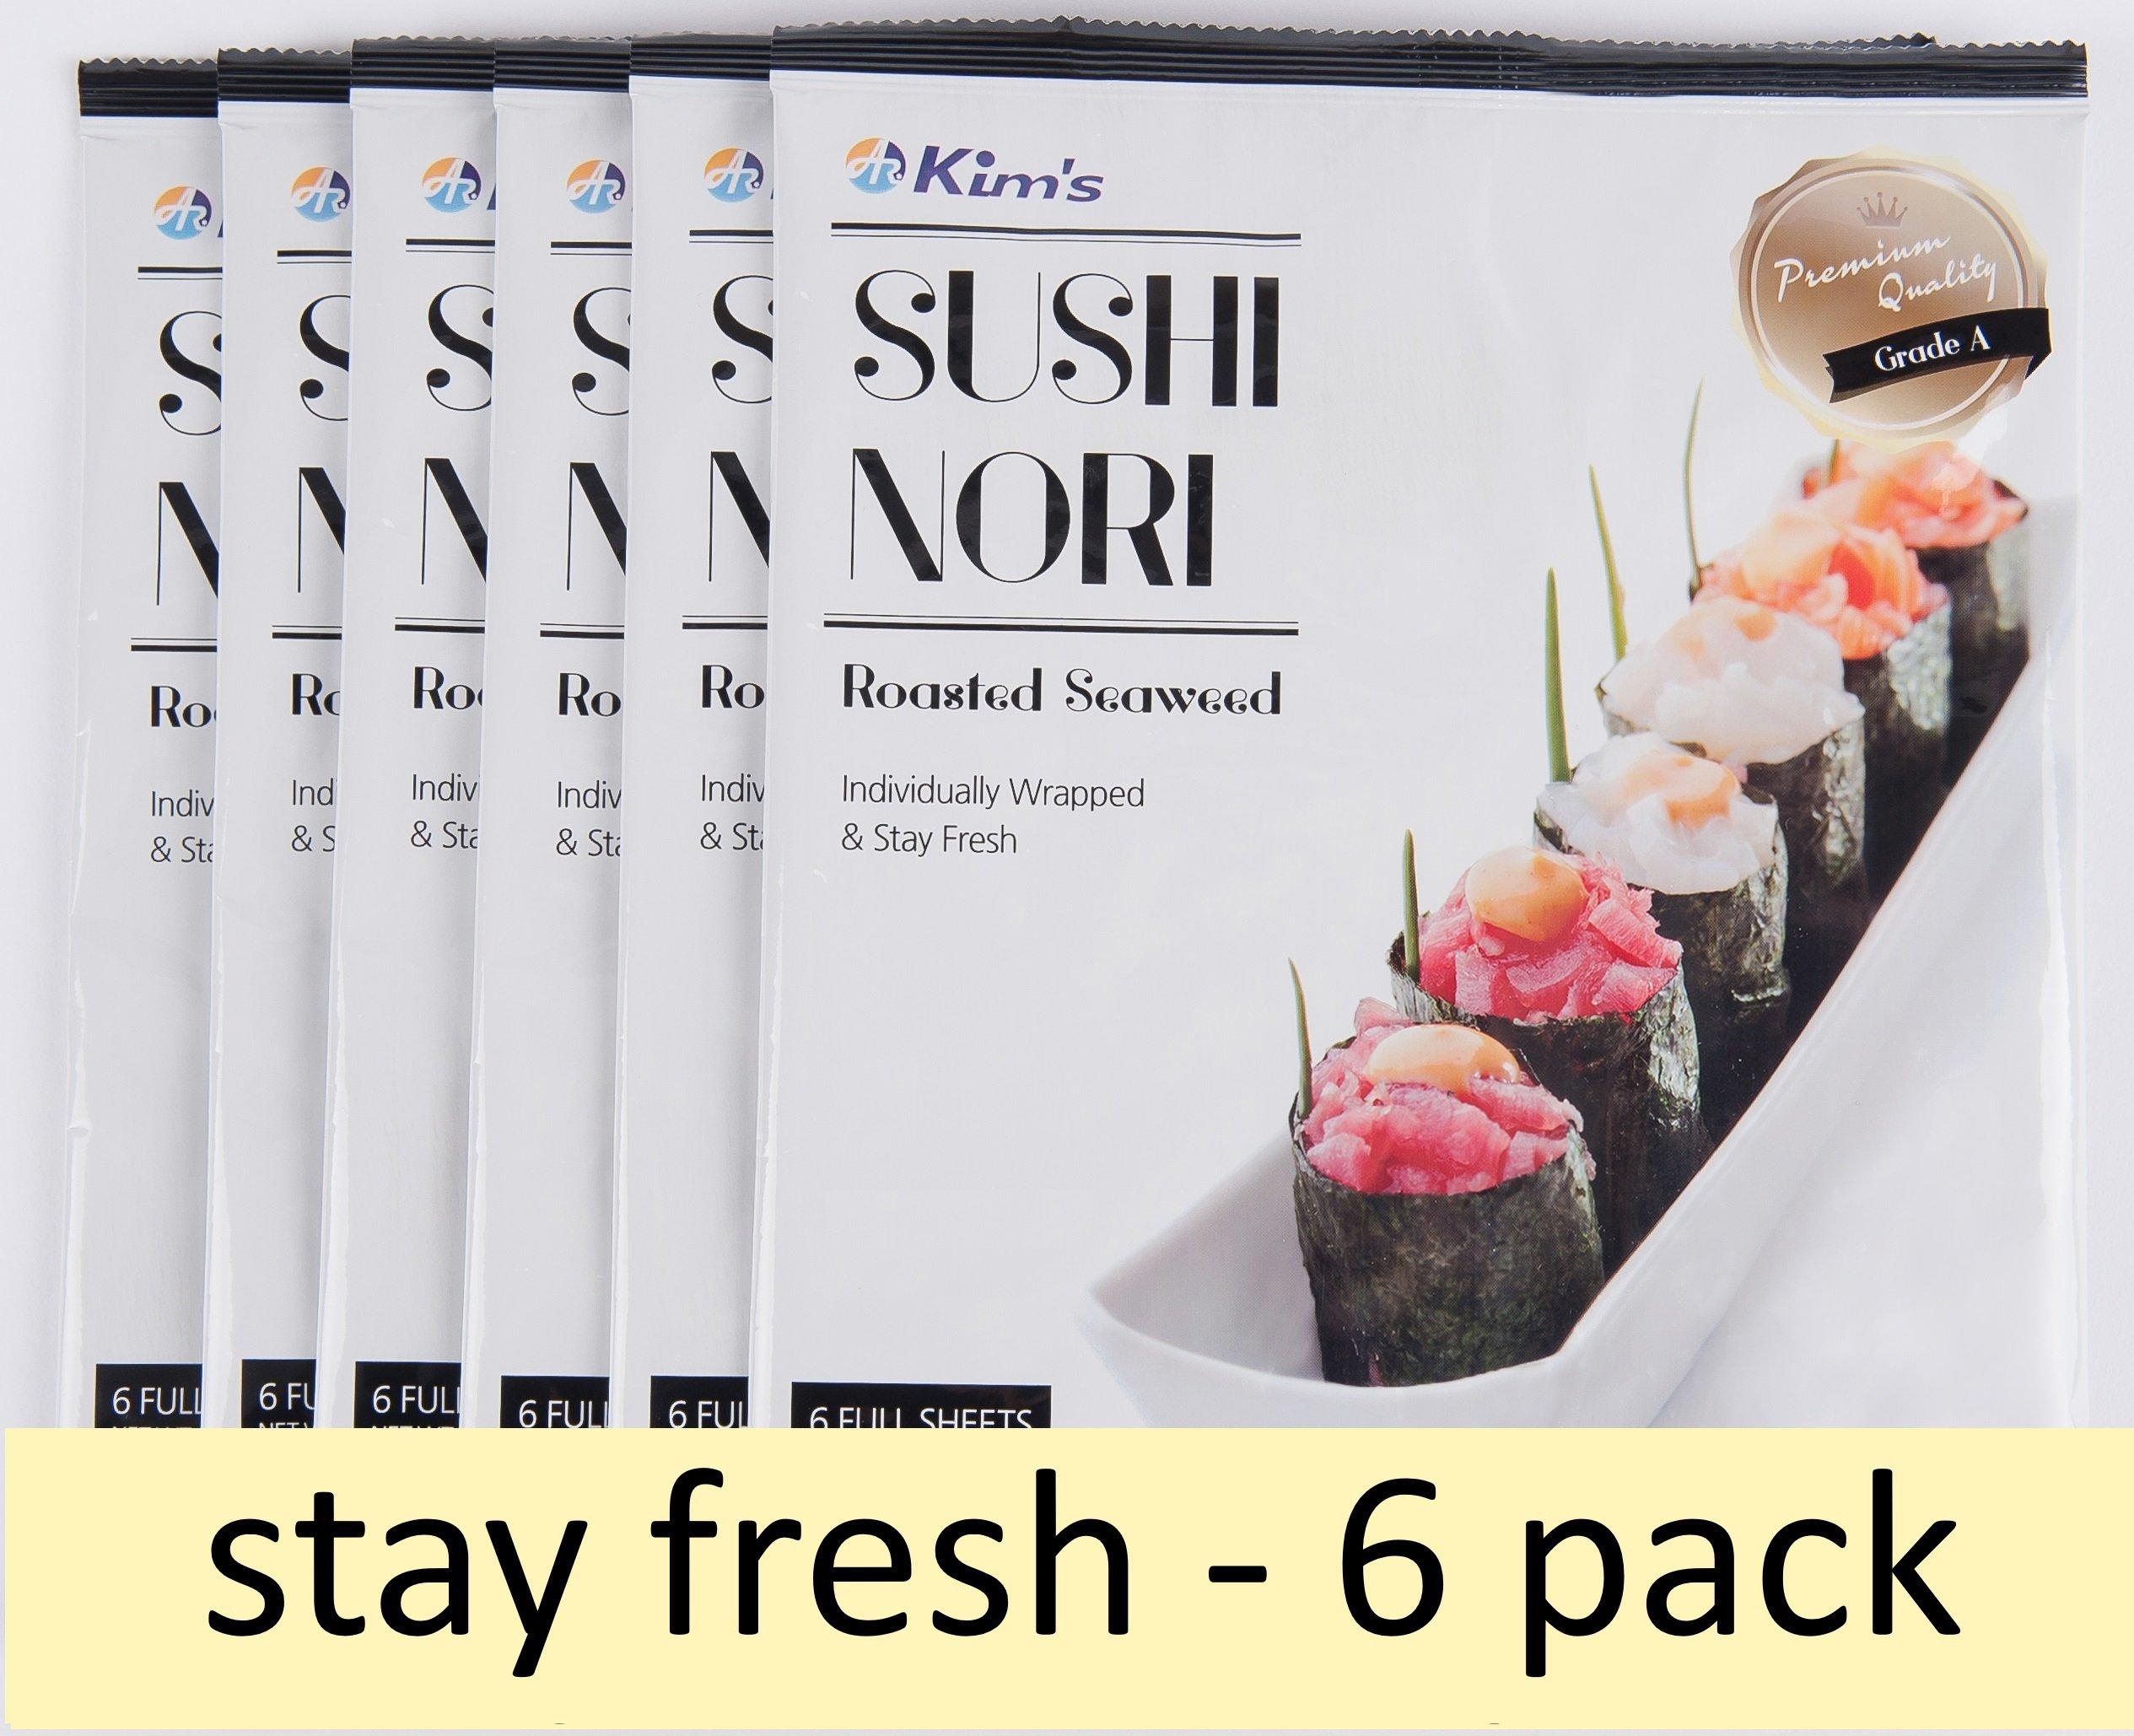 Kim's Premium Sushi Nori Roasted Seaweed (6 full sheets x 6 packs). Individually wrapped and stay fresh